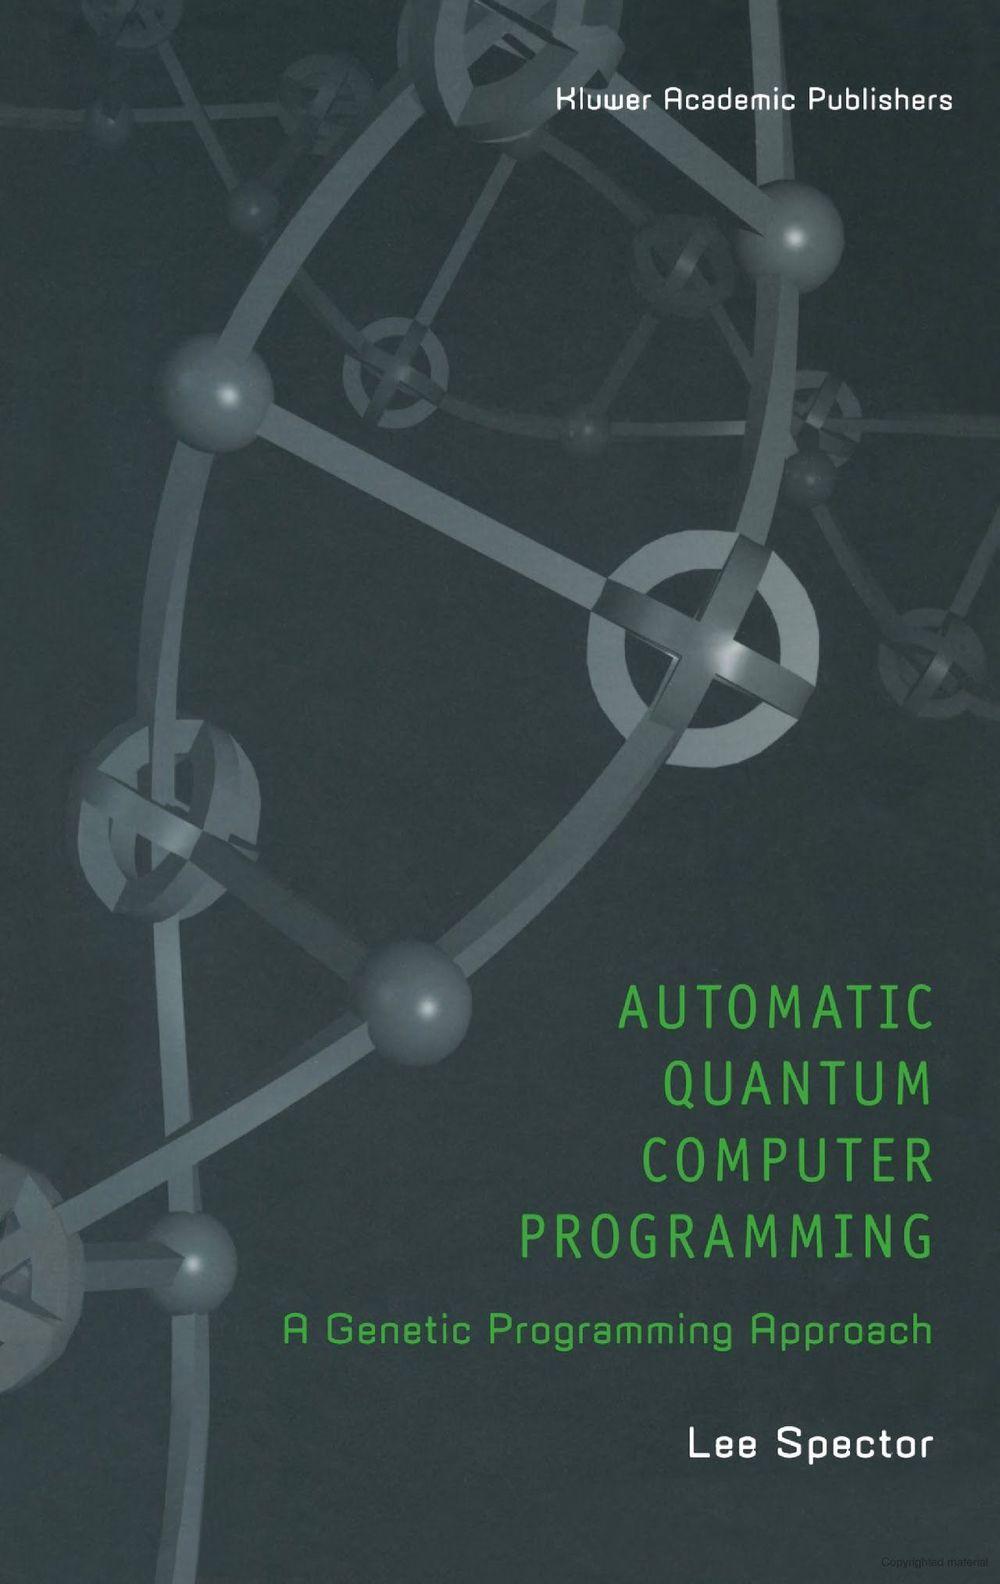 Automatic Quantum Computer Programming: A Genetic